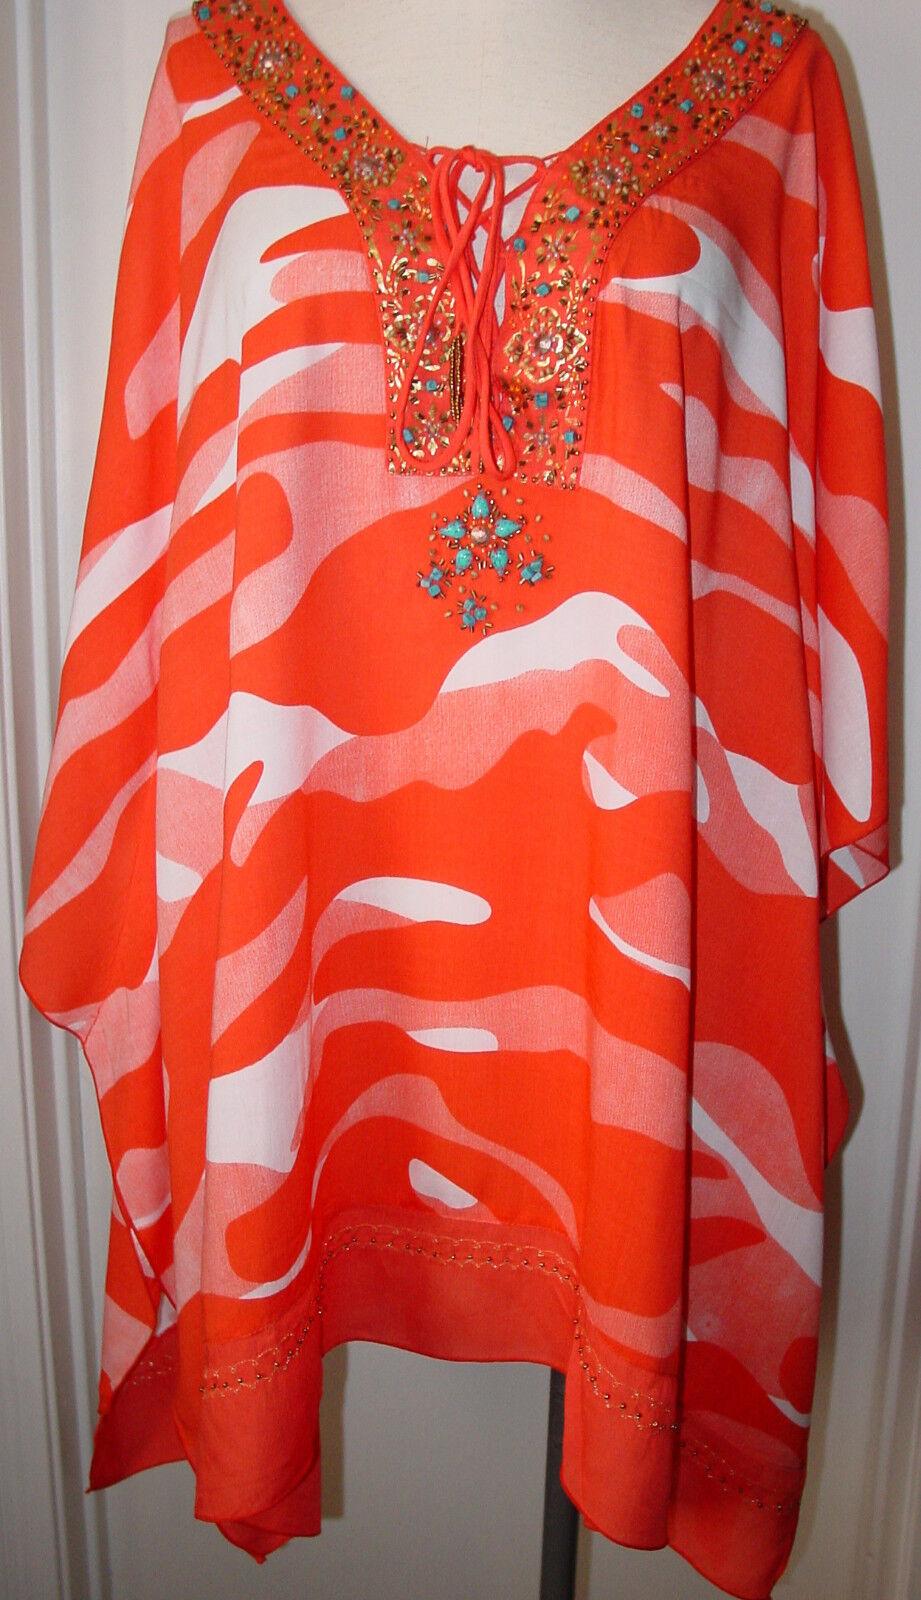 damen Tunic Top Blouse Coral Camo Orange Weiß Krista Lee Beads Embellished NEW